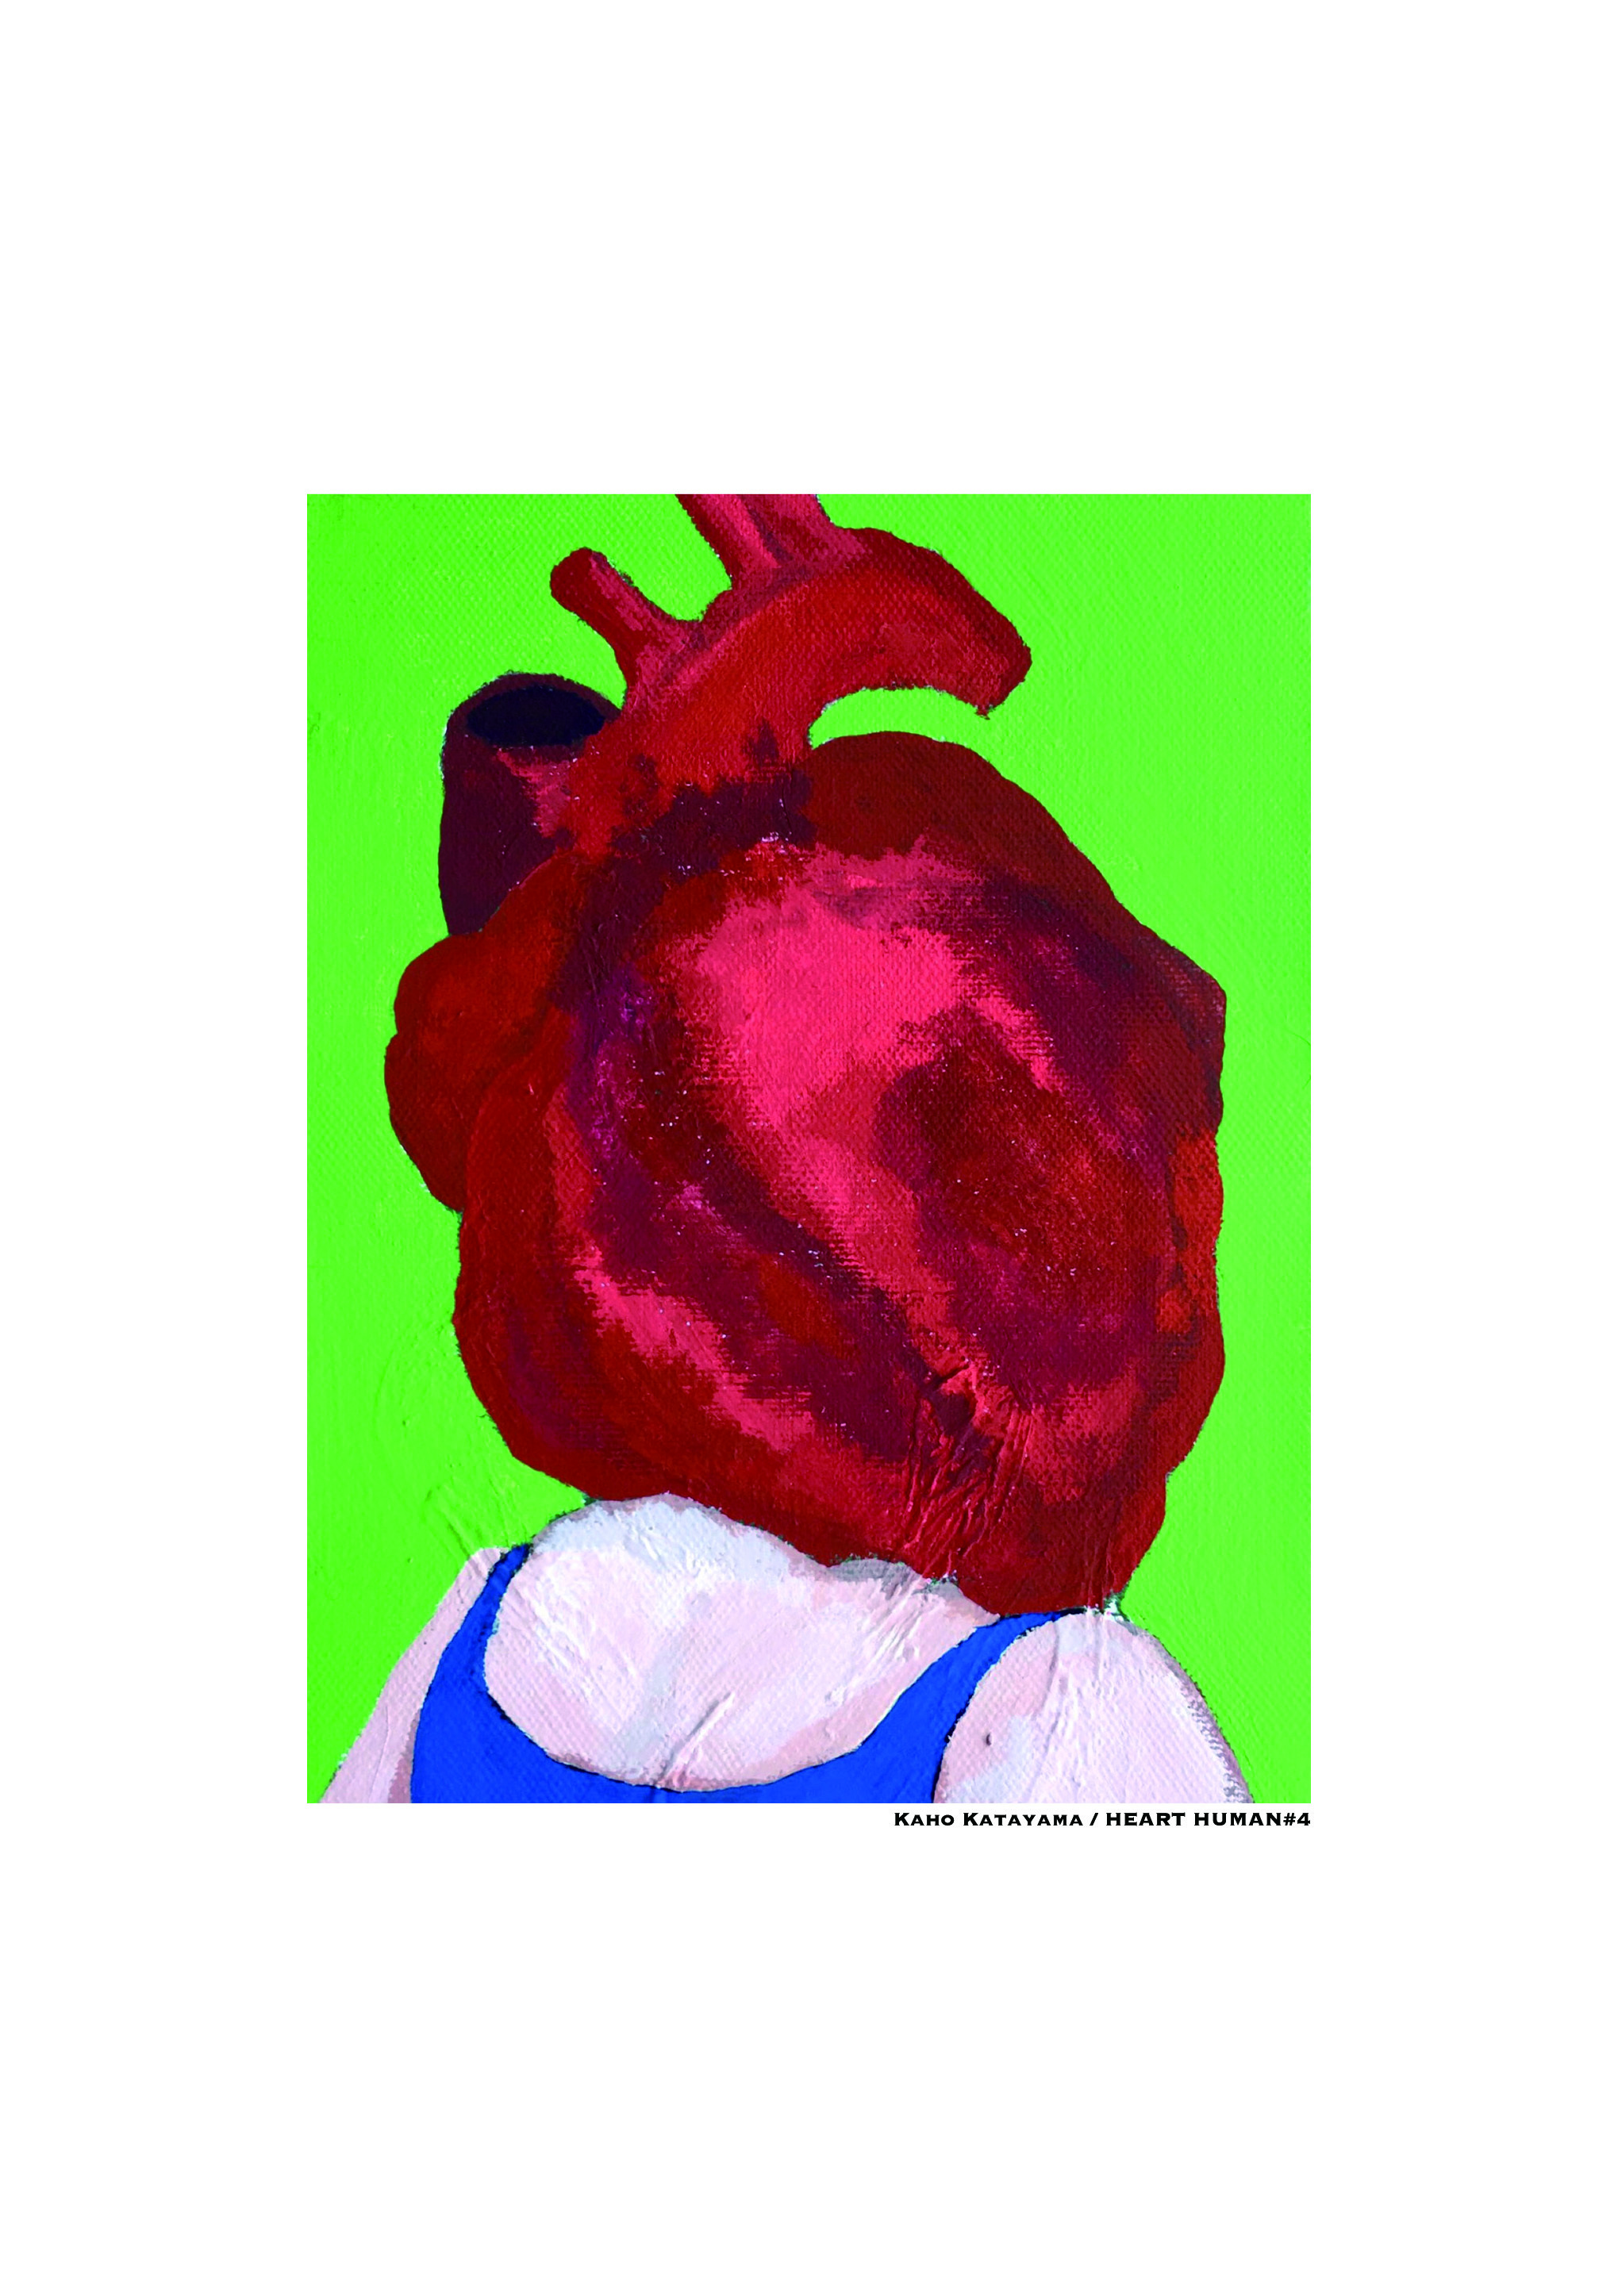 HEART HUMAN #4 /18cm×14cm/Acrylic painting/ Original picture